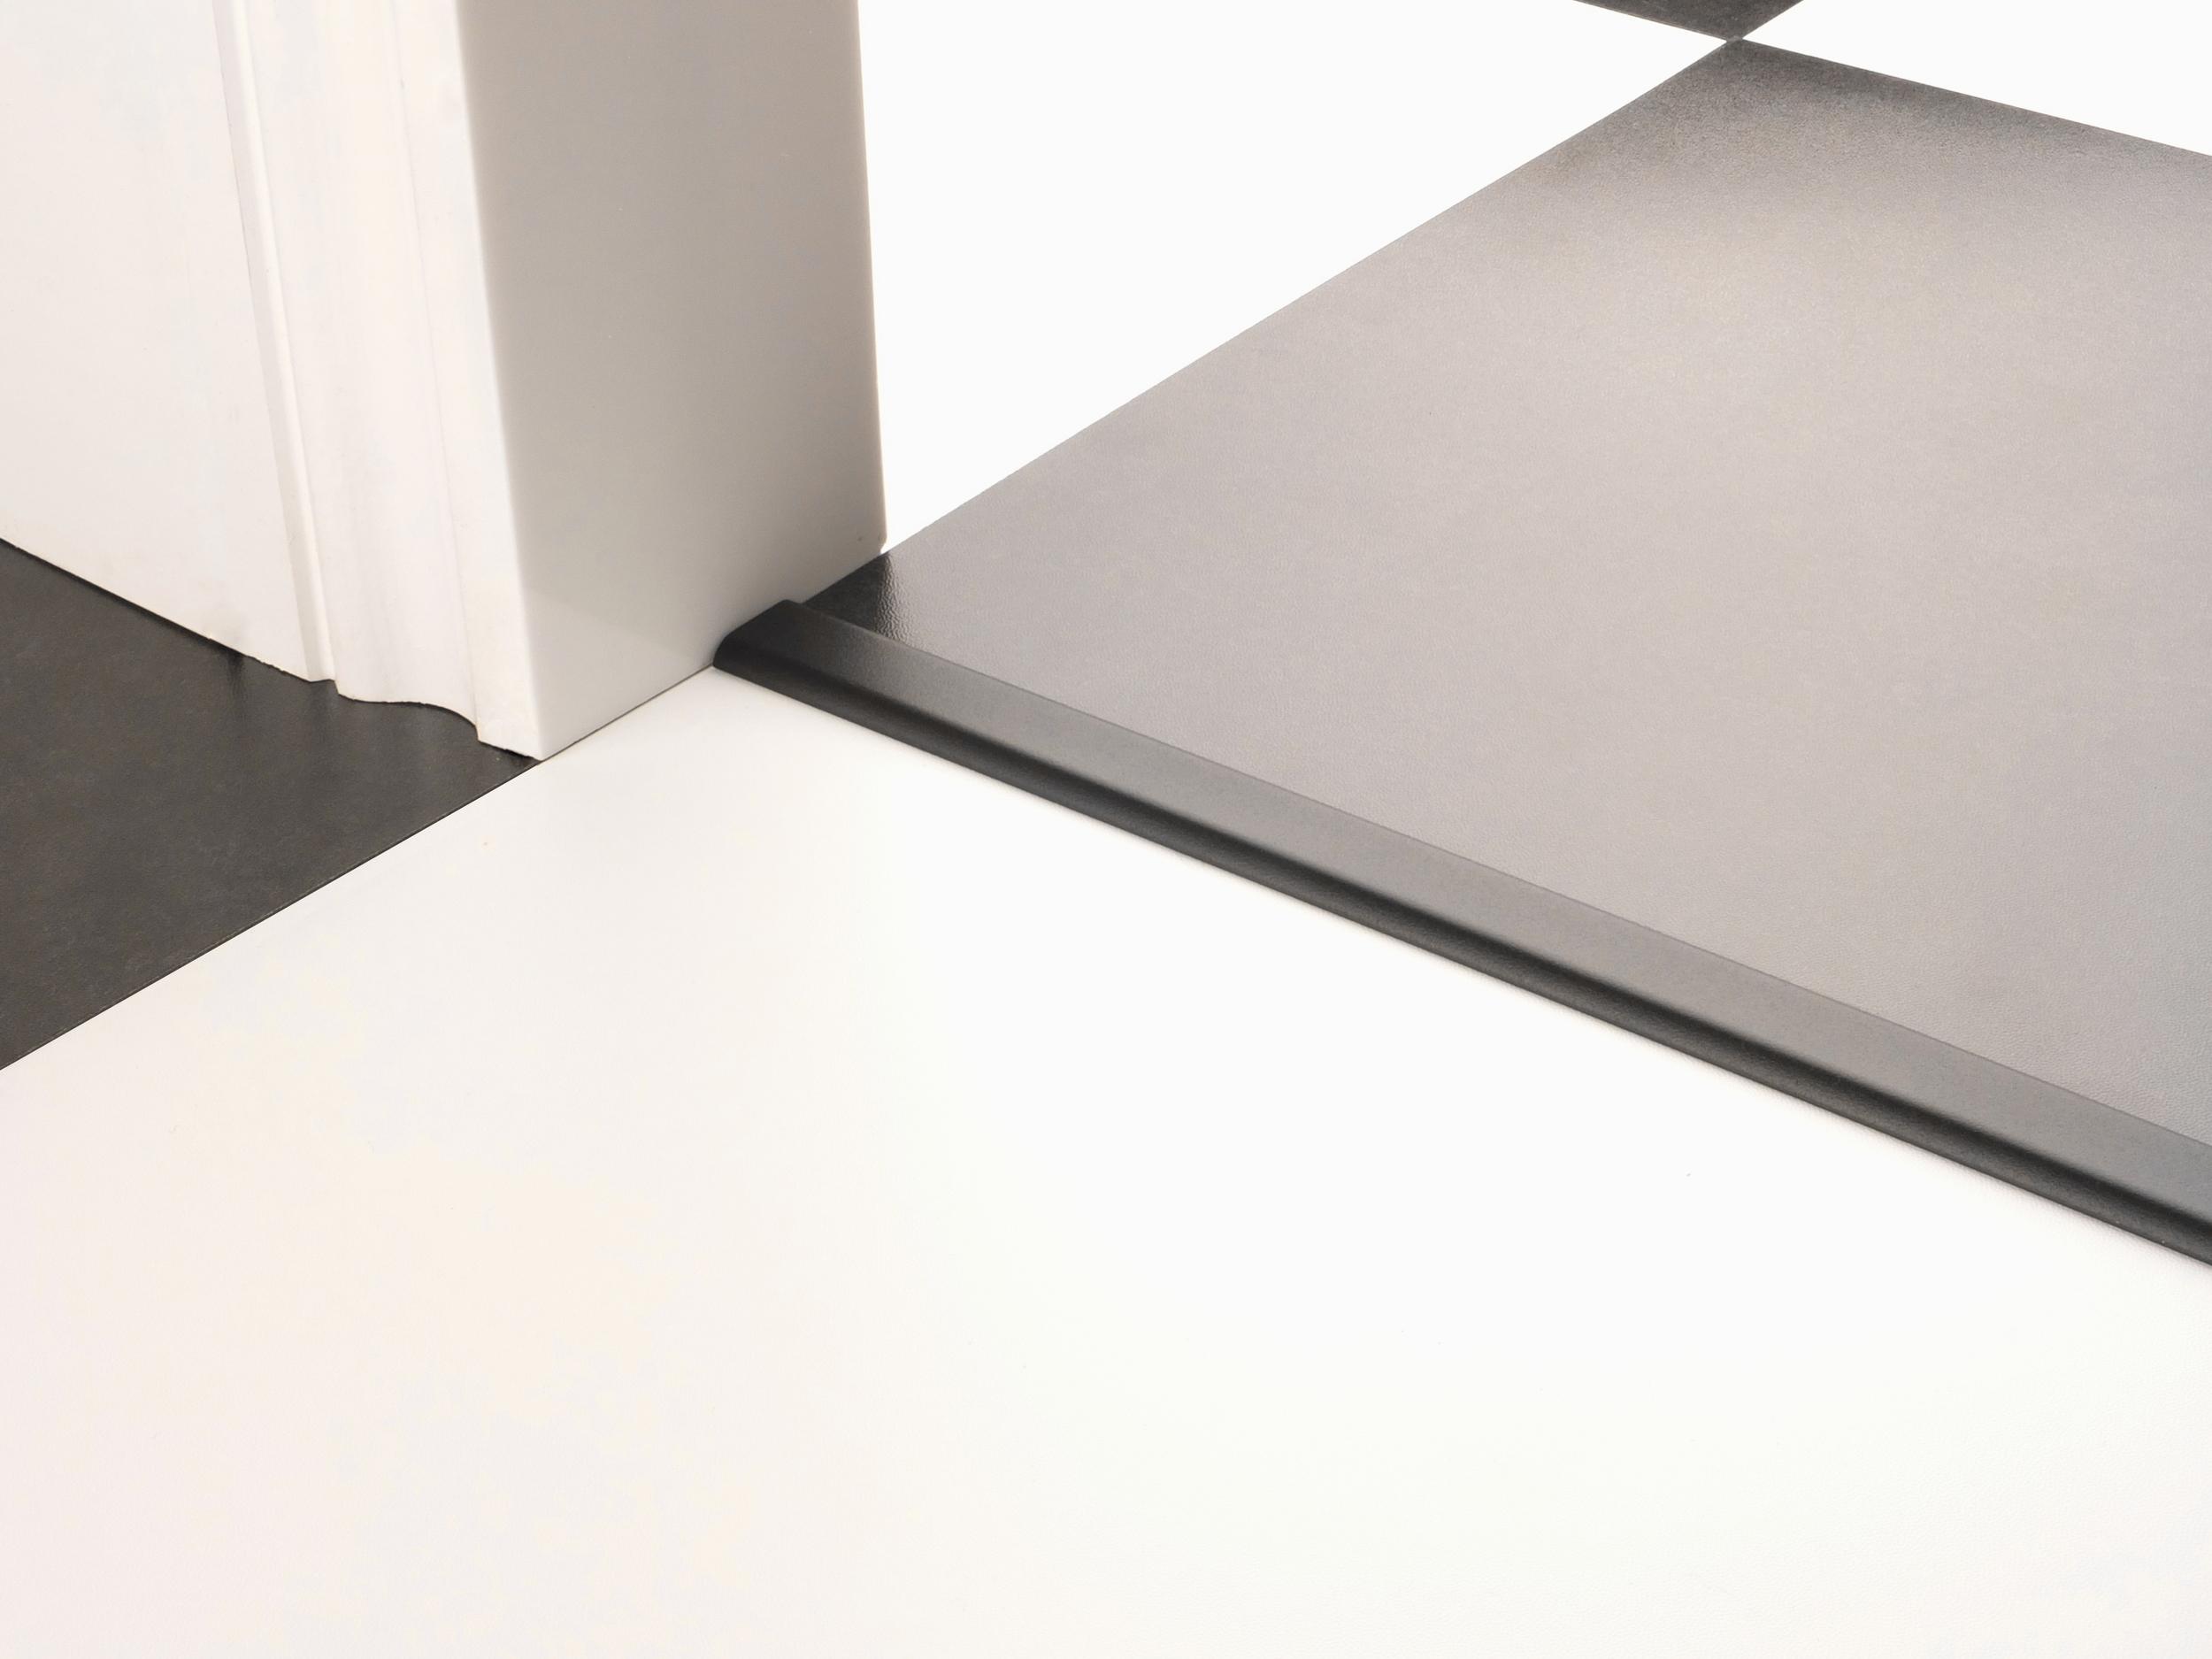 stairrods-doorbar-black-vinyl-edge-2.jpg